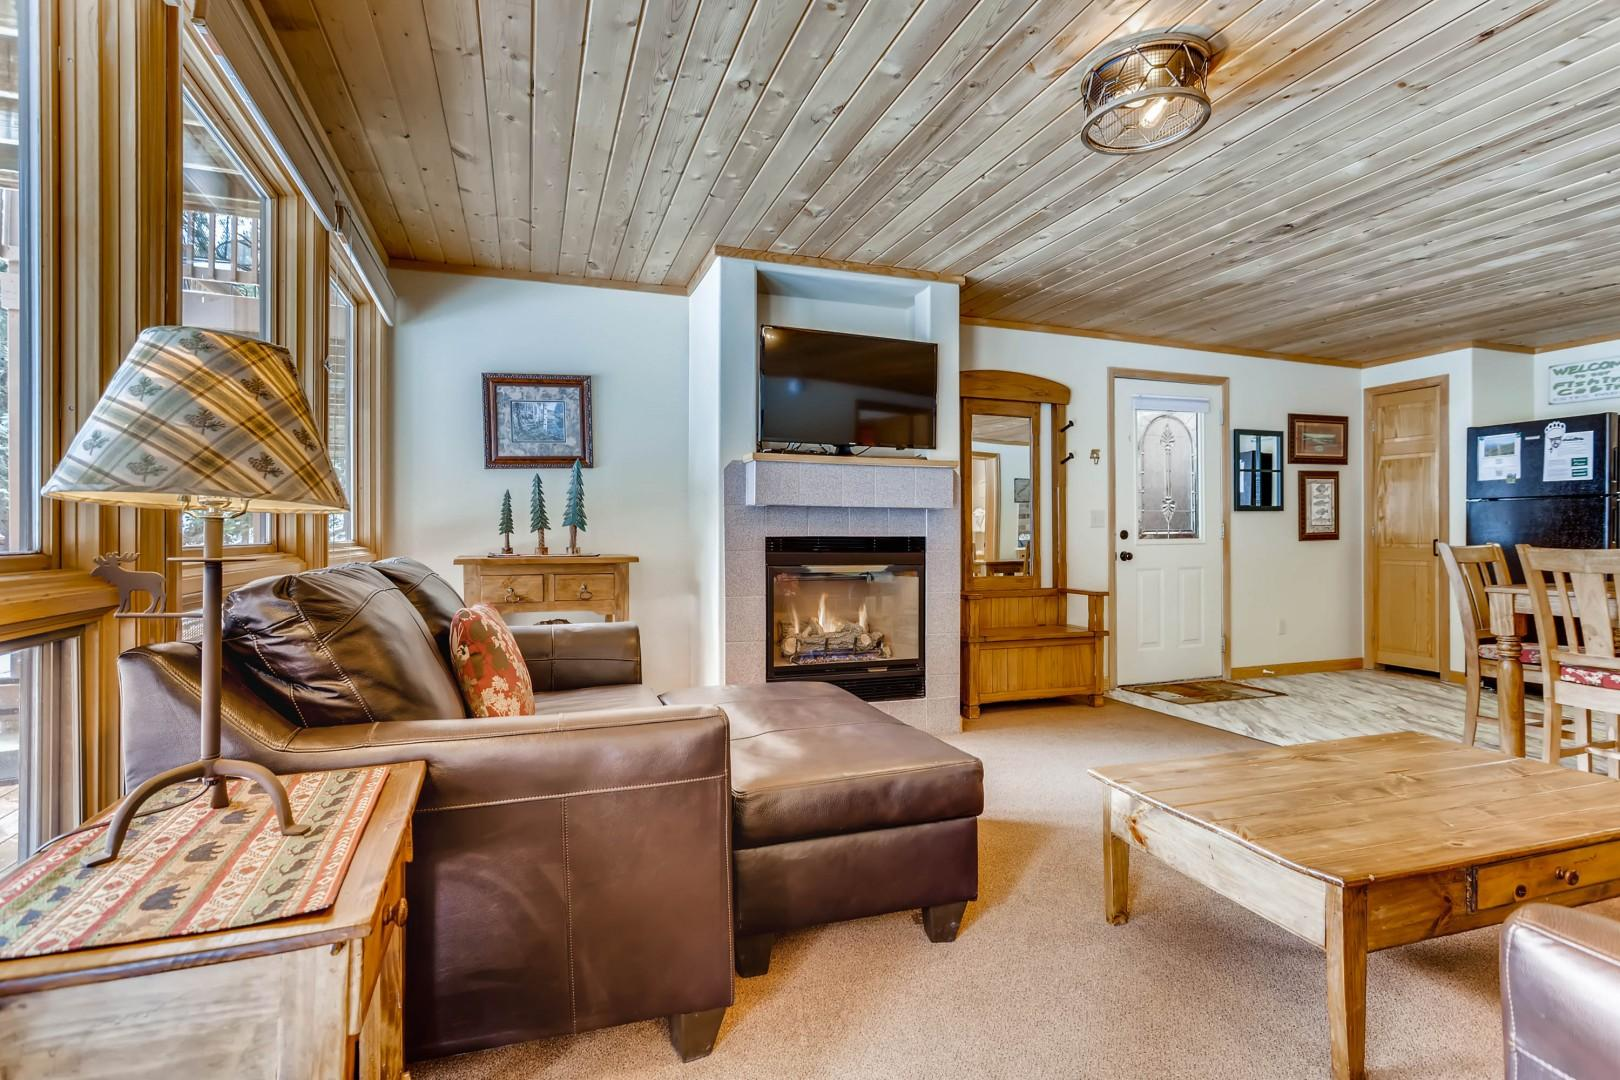 Creekside Suites 17